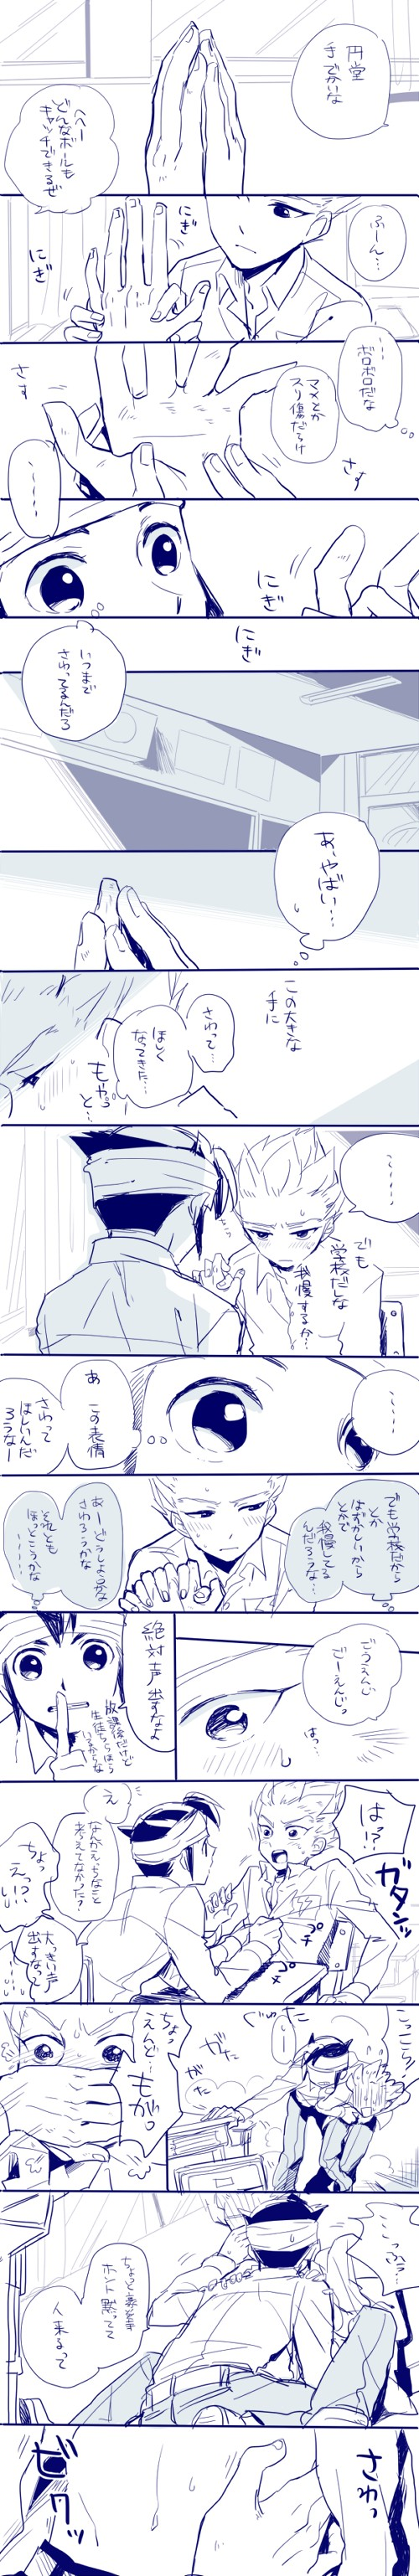 Tags: Anime, Pantu555, Inazuma Eleven, Gouenji Shuuya, Endou Mamoru, Pixiv, Translation Request, Comic